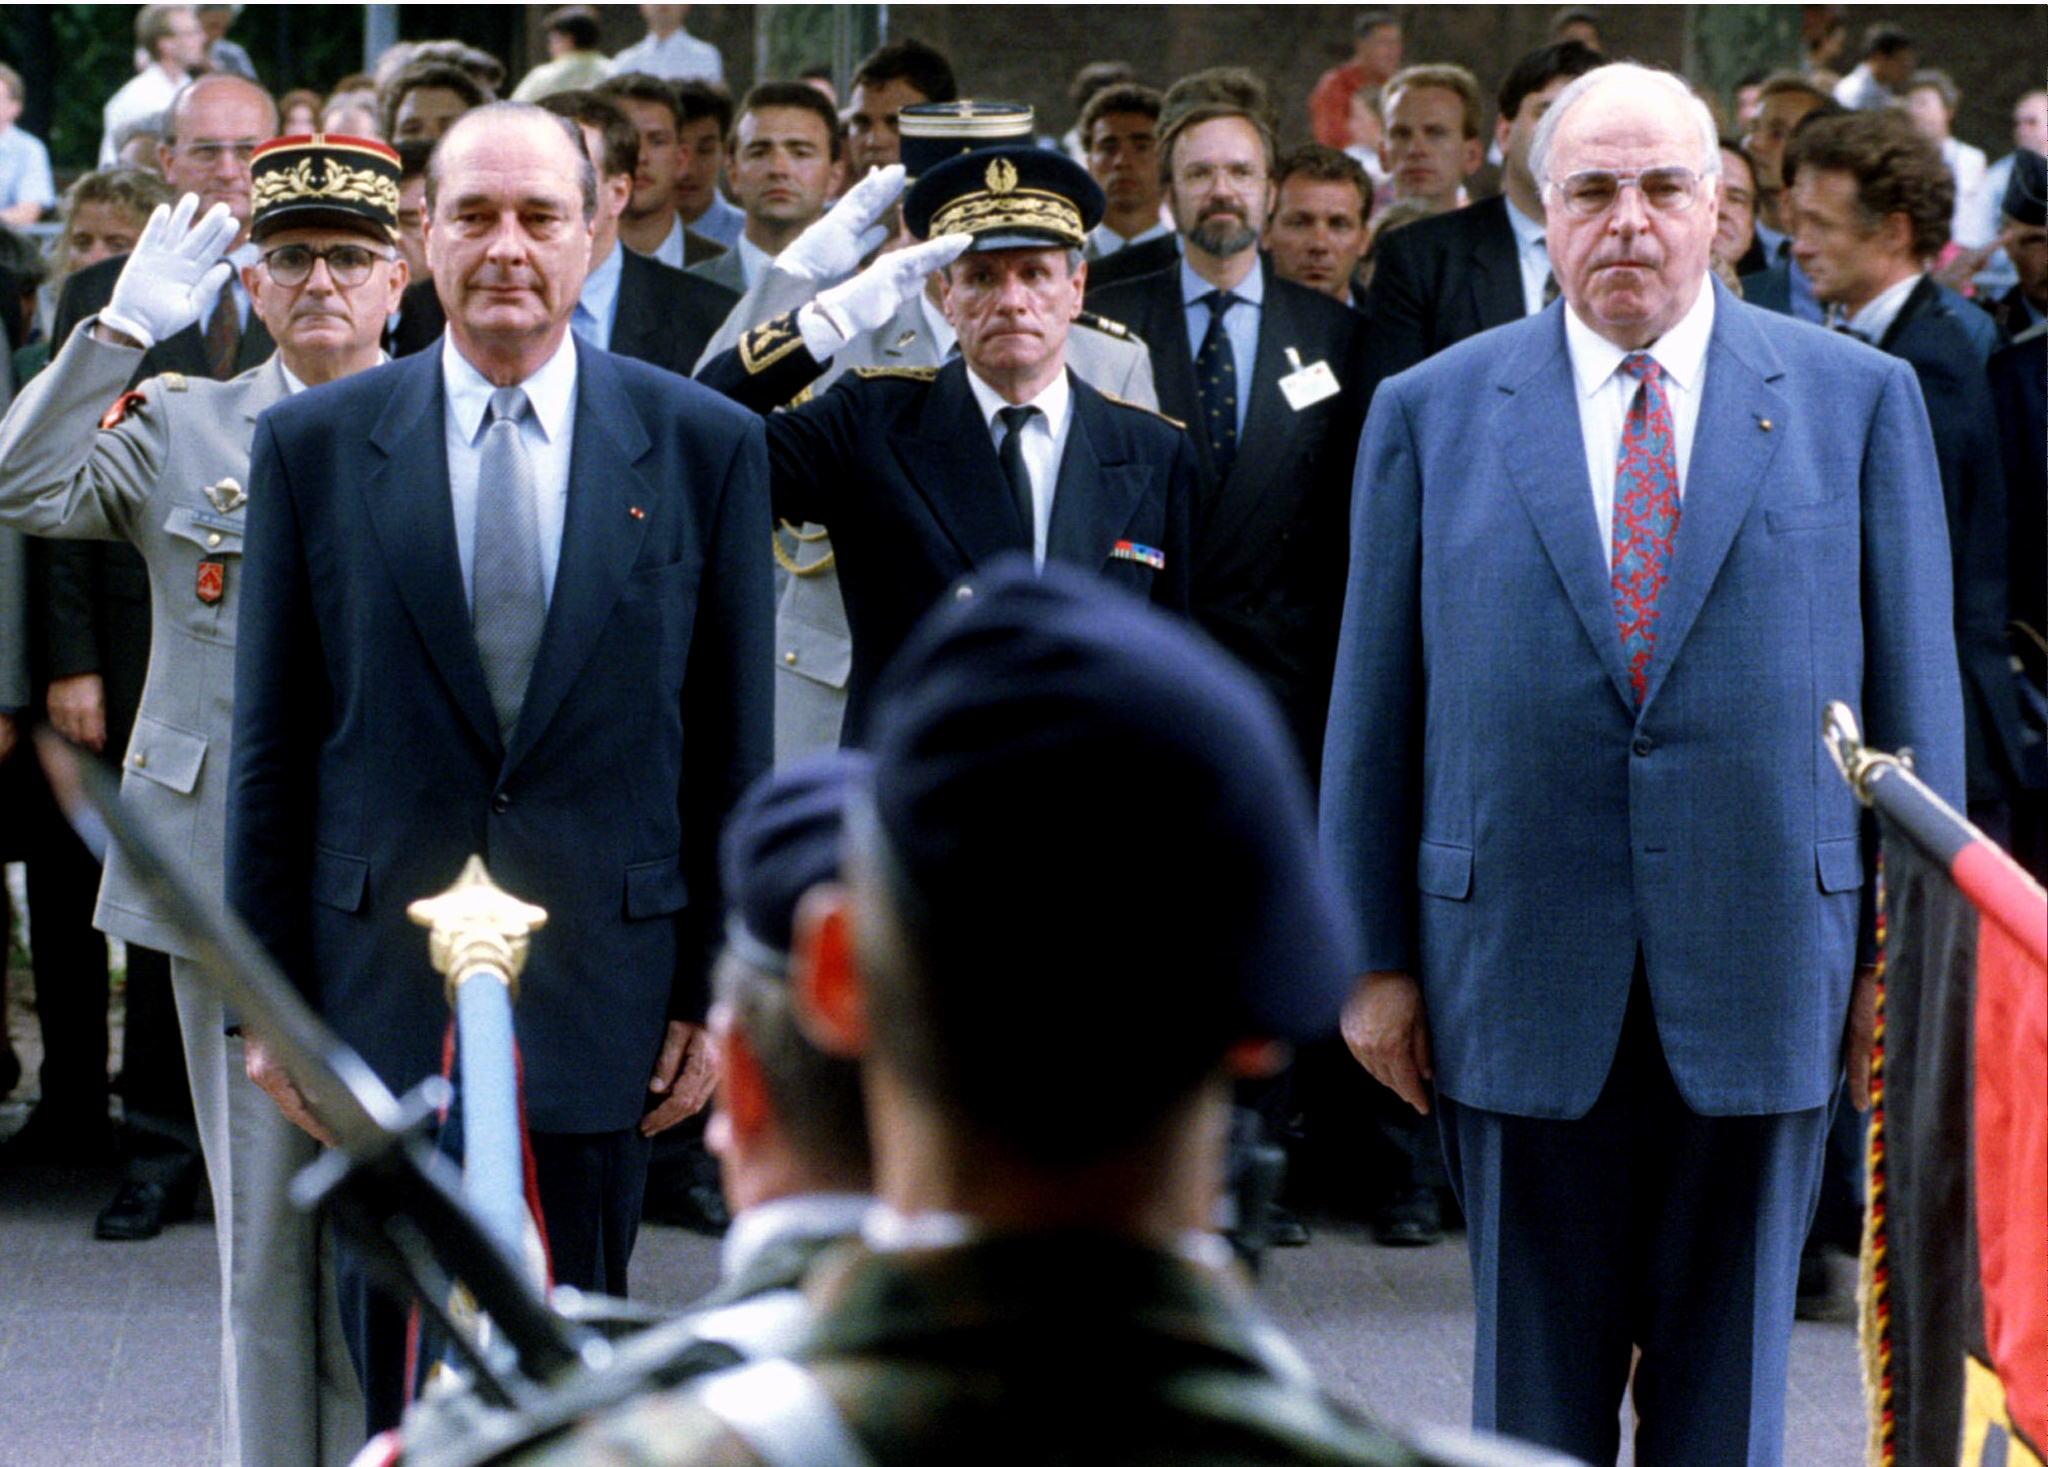 Presidente francês Jacques Chirac e Helmut Kohl durante o início da 65.ª cimeira franco-alemã